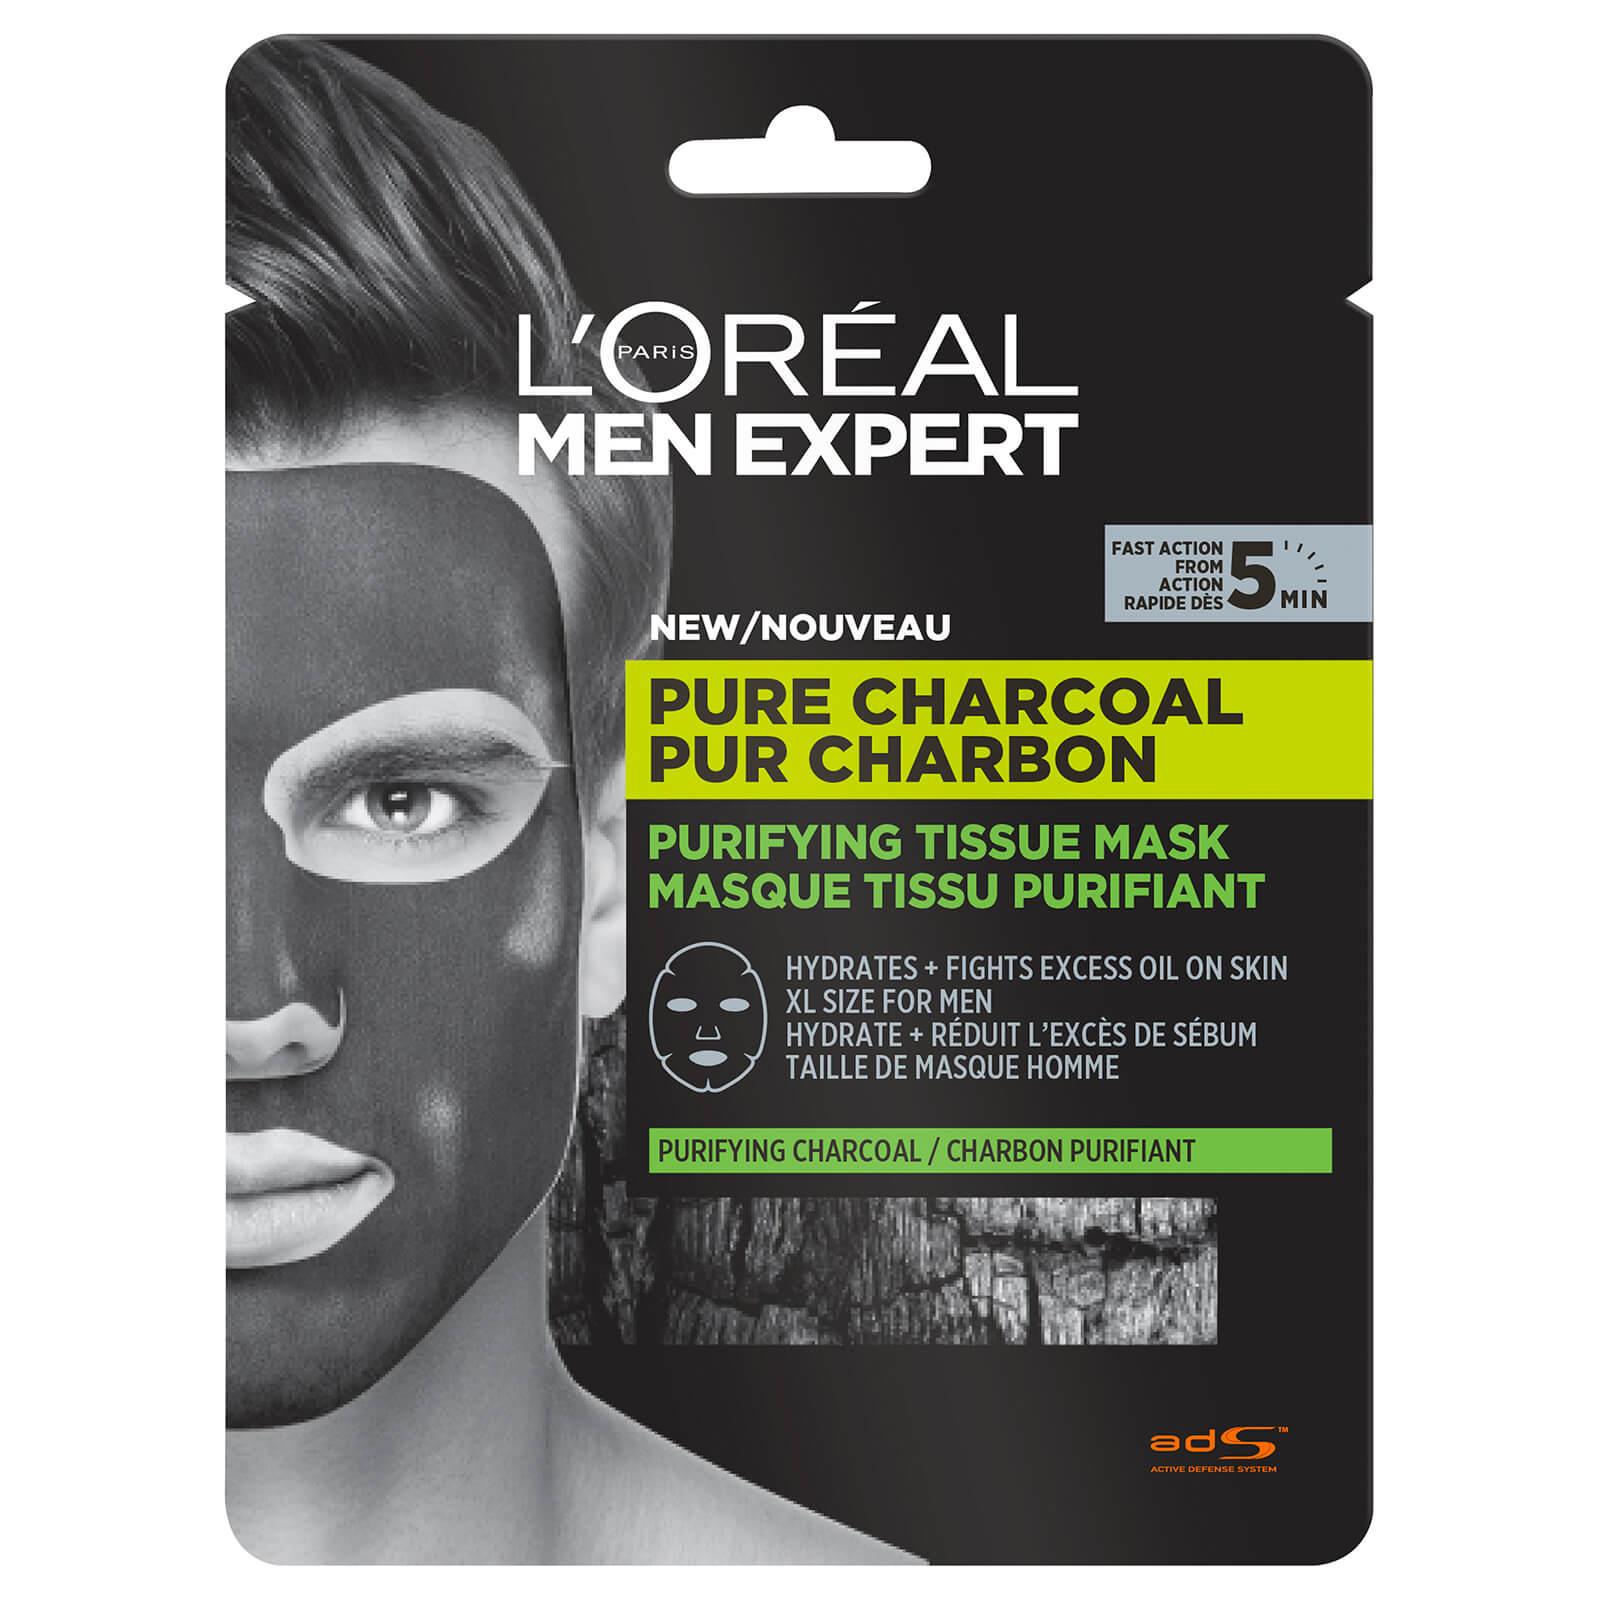 Mascarilla de carbón purificante de L'Oréal Men Expert